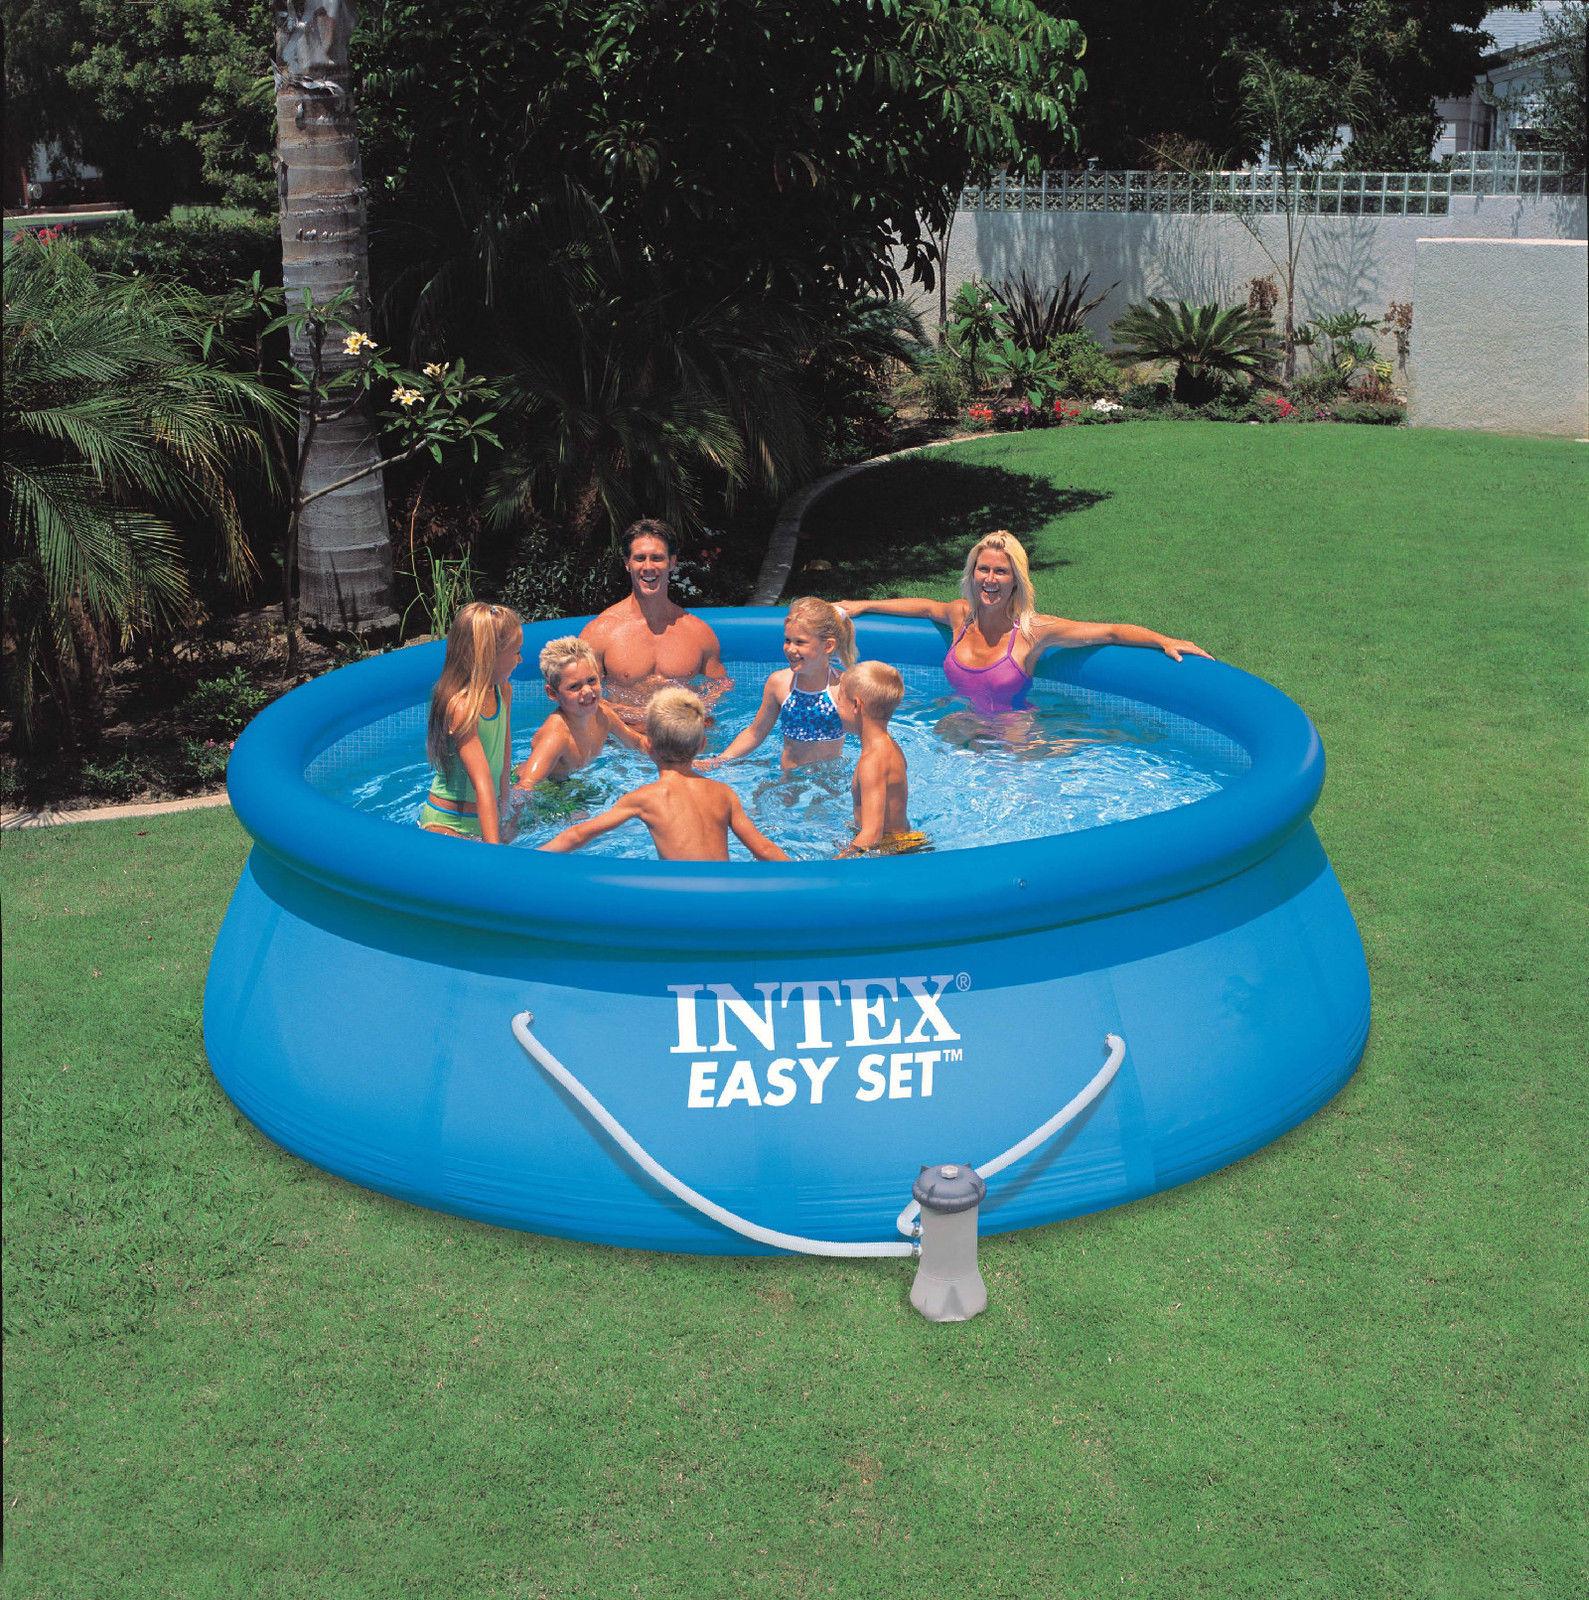 "Intex Pools intex 13' x 33"" easy set swimming pool with 530 gfci gph filter"